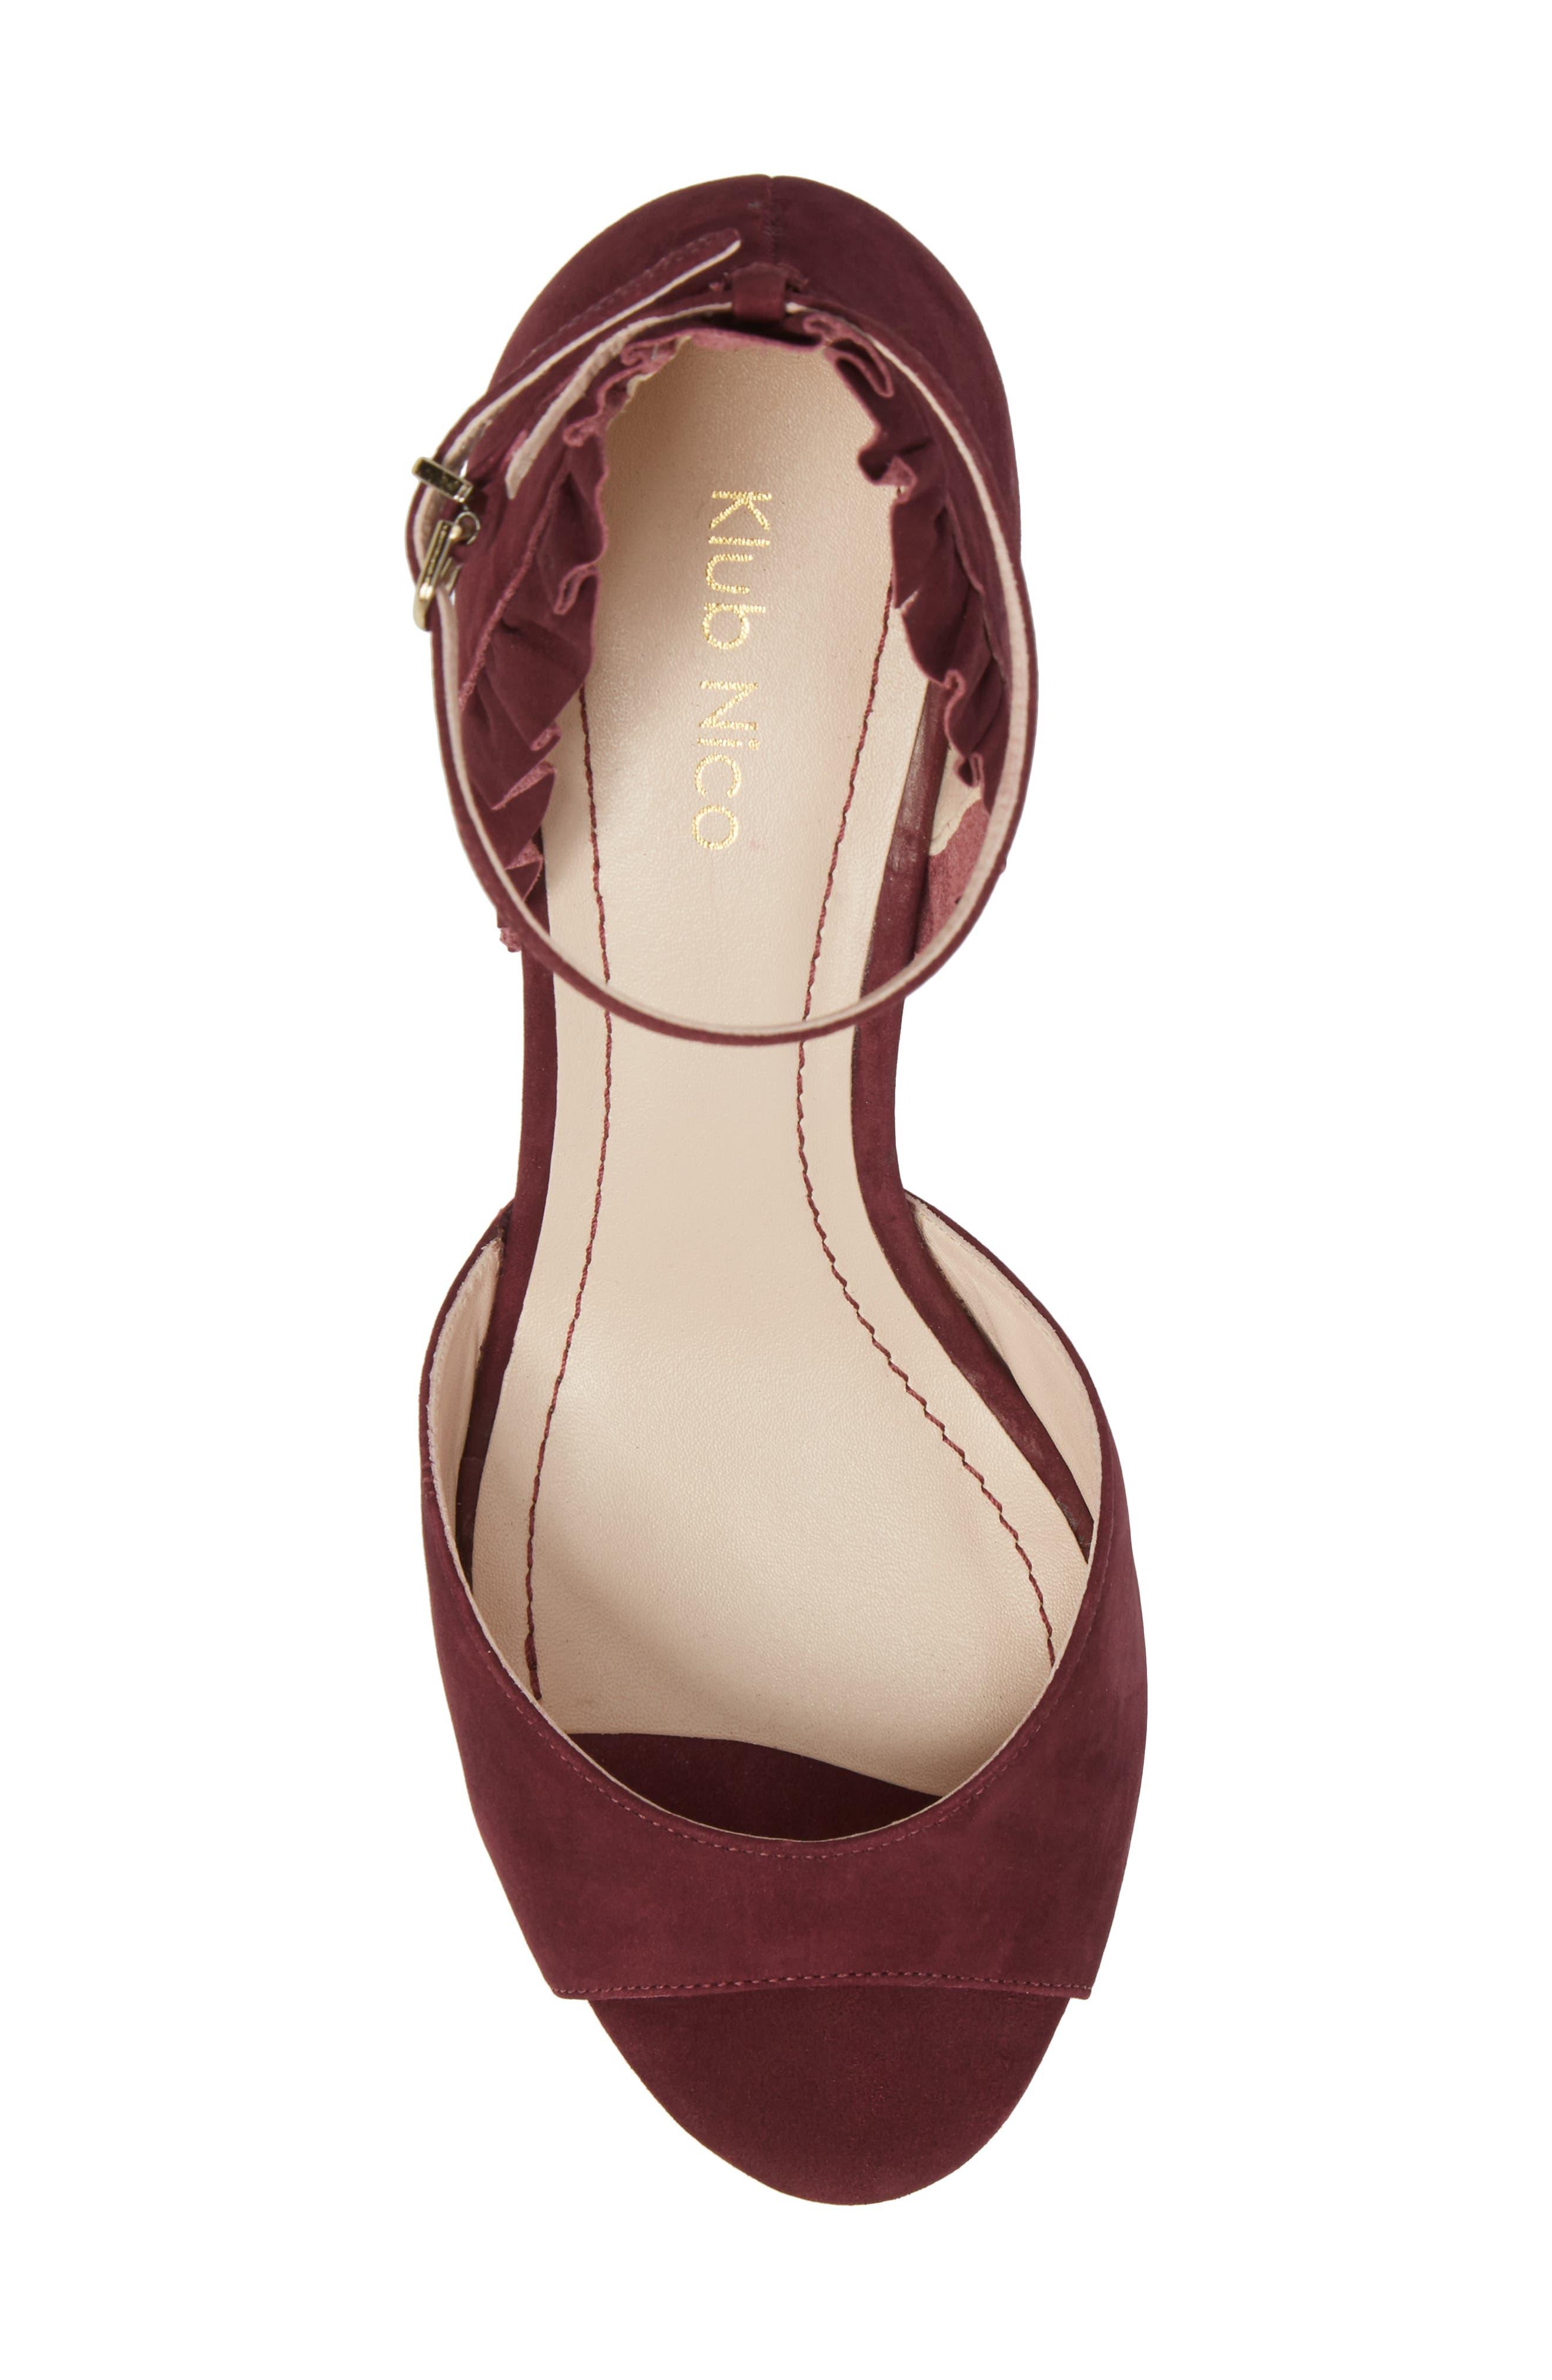 Alisa d'Orsay Sandal,                             Alternate thumbnail 5, color,                             Wine Nubuck Leather